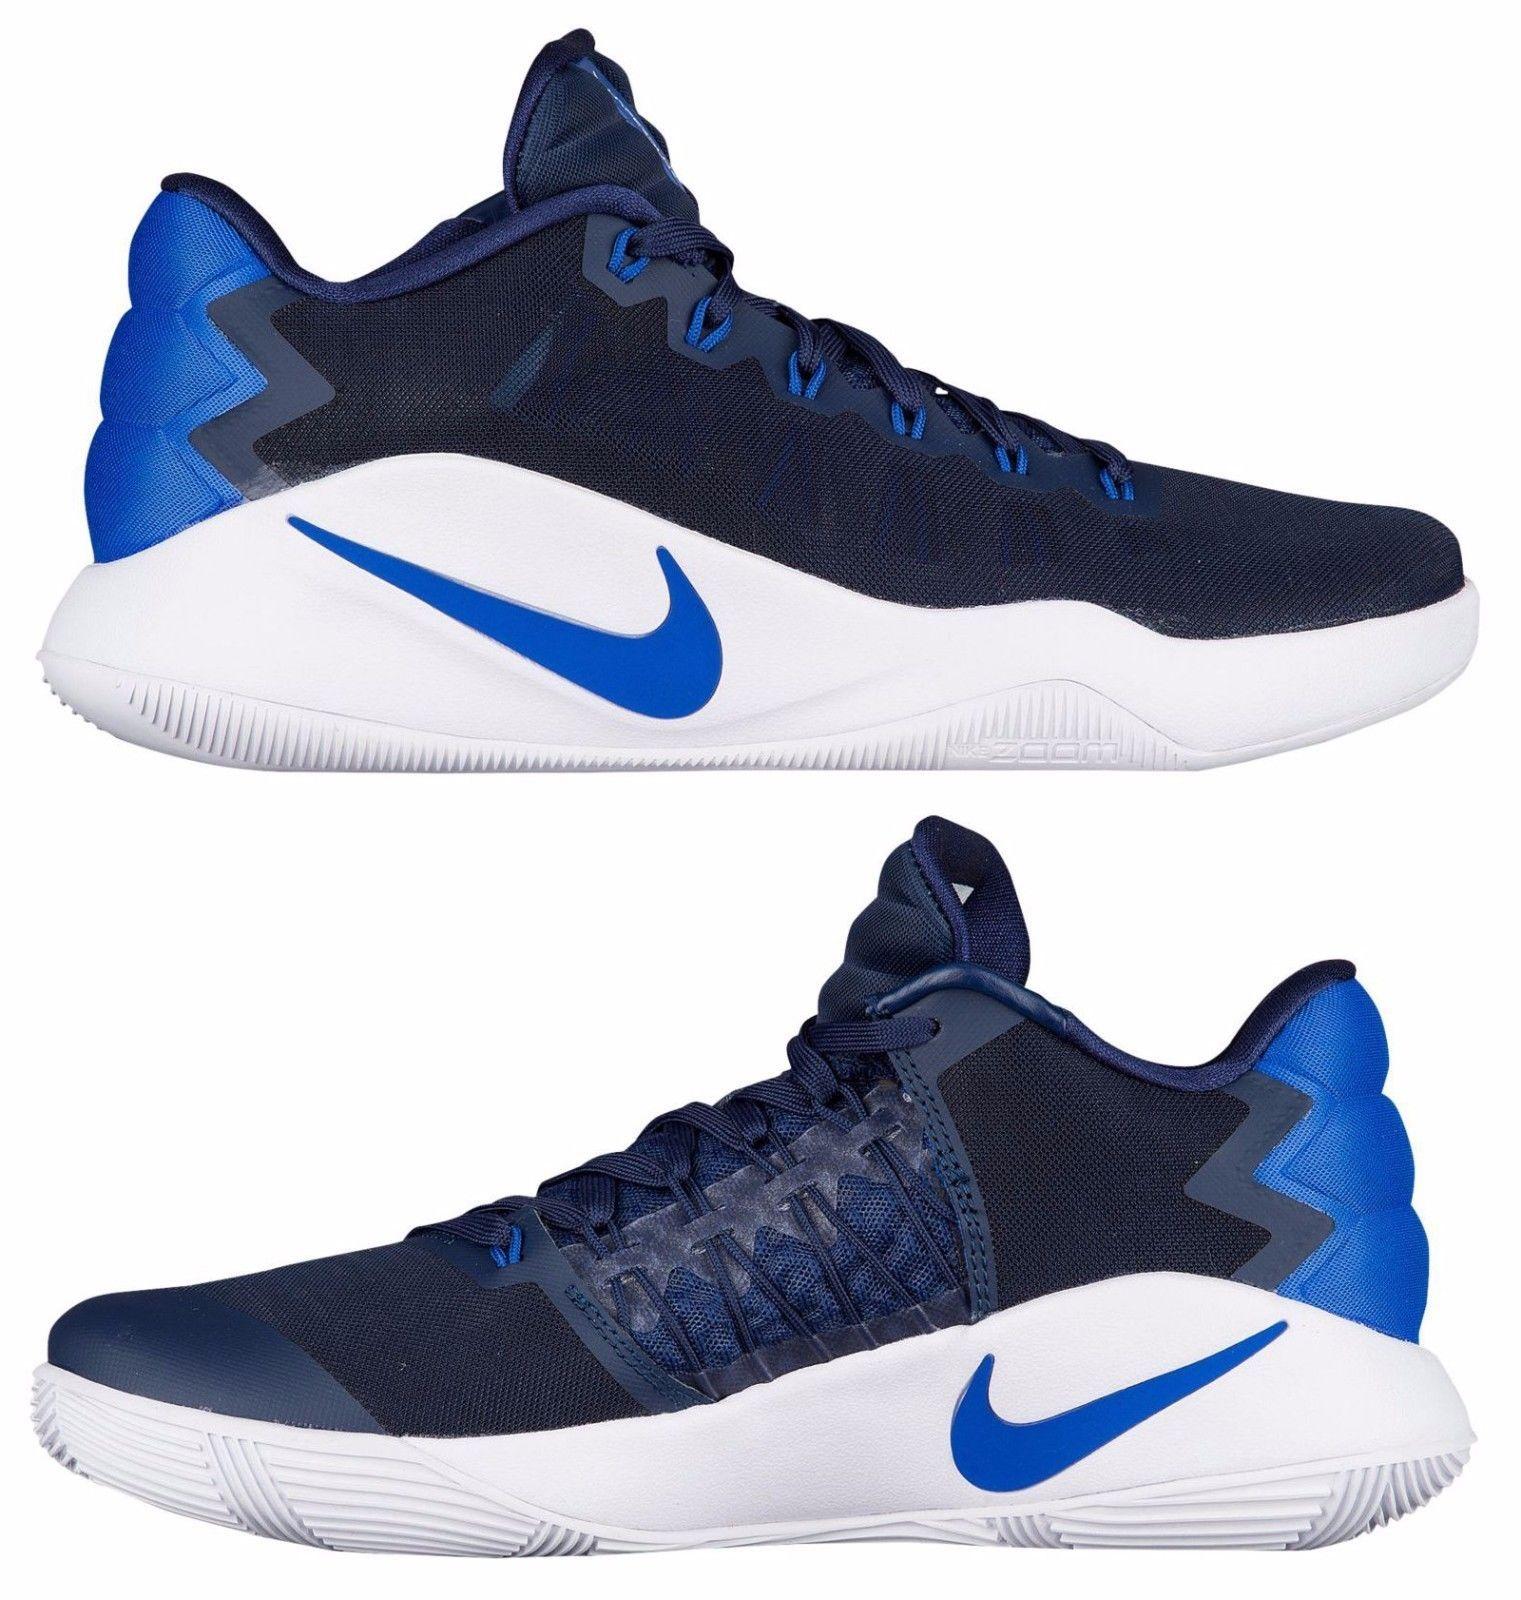 NIKE HYPERDUNK 2016 LOW MEN\u0027S BASKETBALL MIDNIGHT NAVY - GAME ROYAL - PHOTO  BLUE